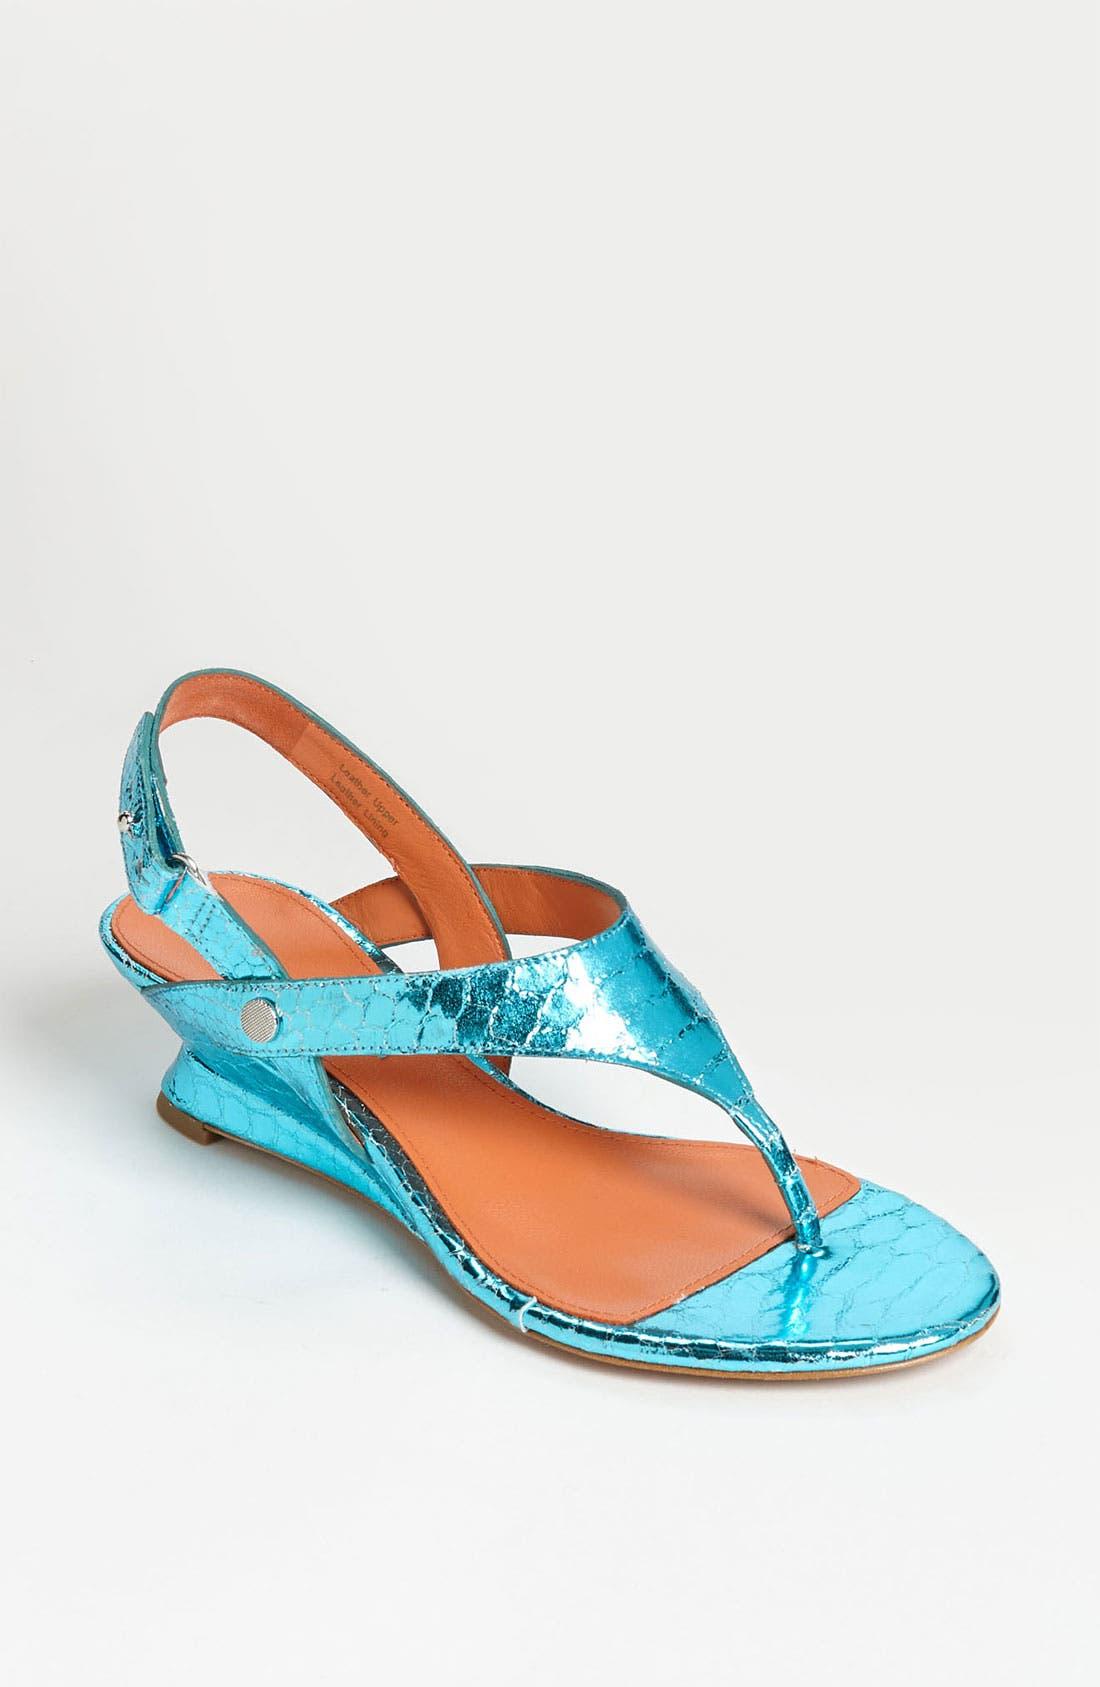 Alternate Image 1 Selected - Via Spiga 'Leanne' Sandal